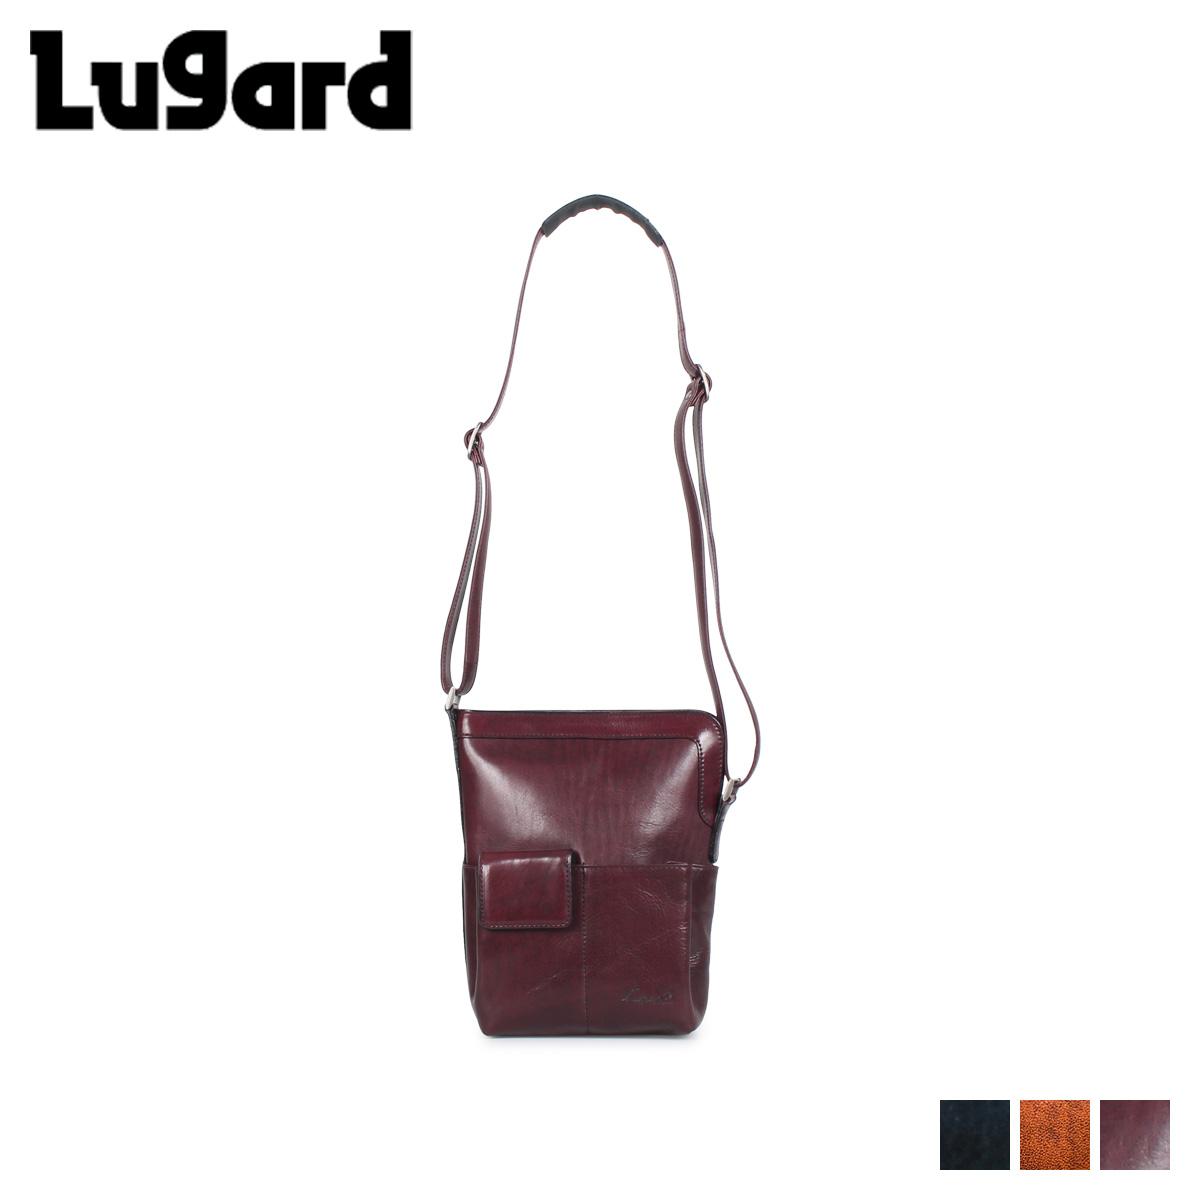 Lugard ラガード 青木鞄 ジースリー バッグ ショルダーバッグ メンズ G3 SHOULDER BAG ネイビー ブラウン ボルドー 5215 [4/23 追加入荷]